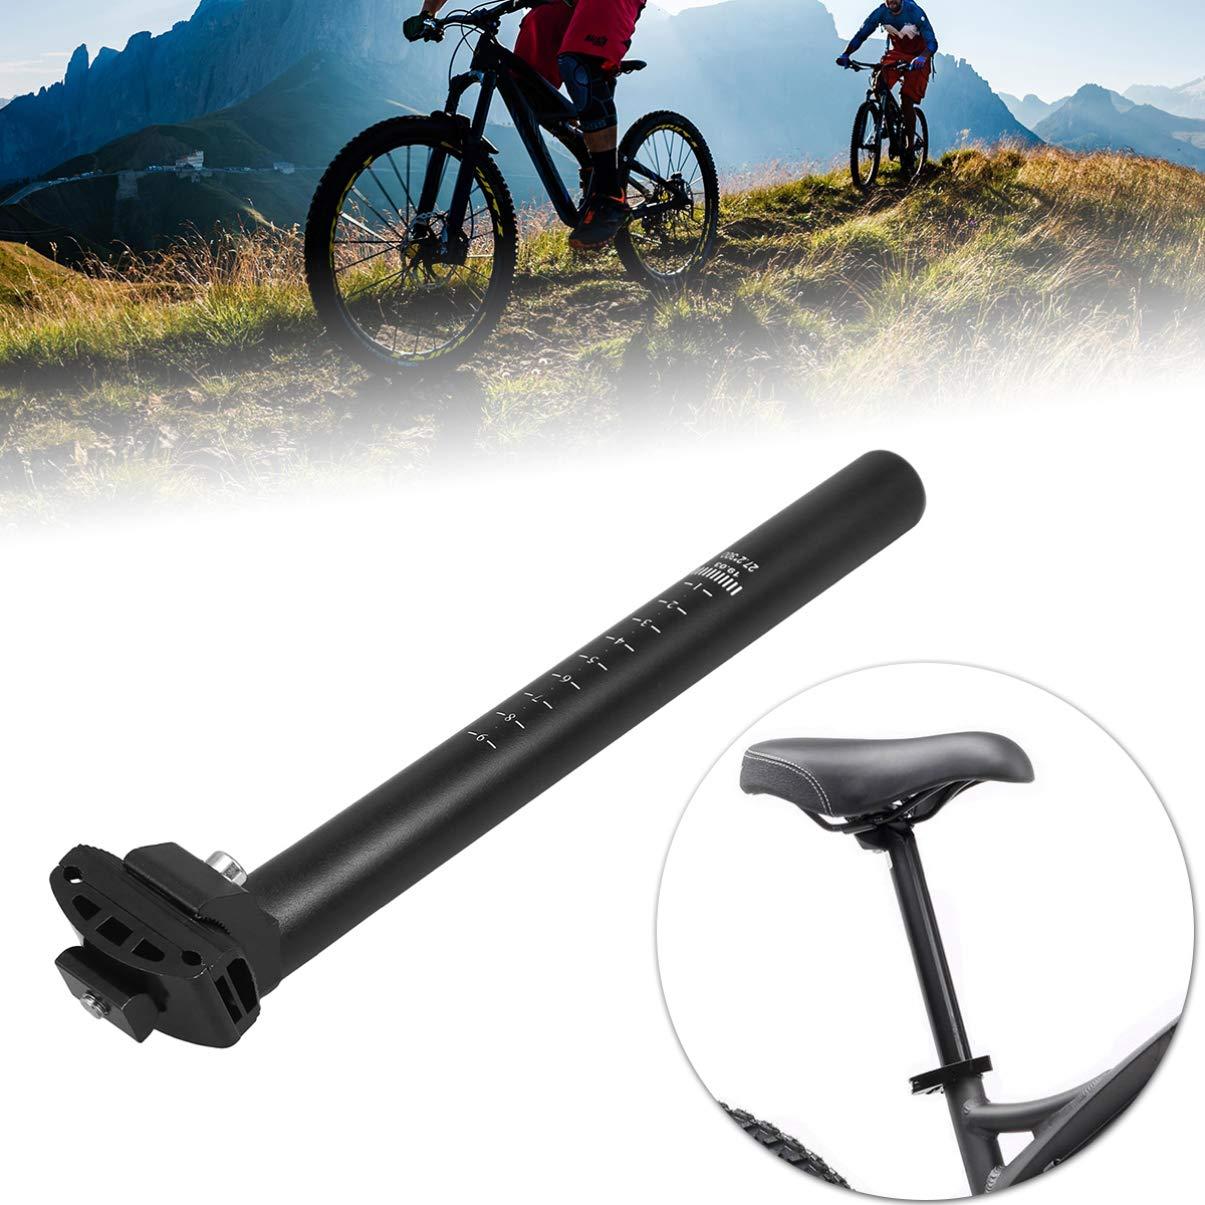 Iron Mountain Road Bike Seatpost Bicycle Extender Seat Post Tube 27.2mm Black